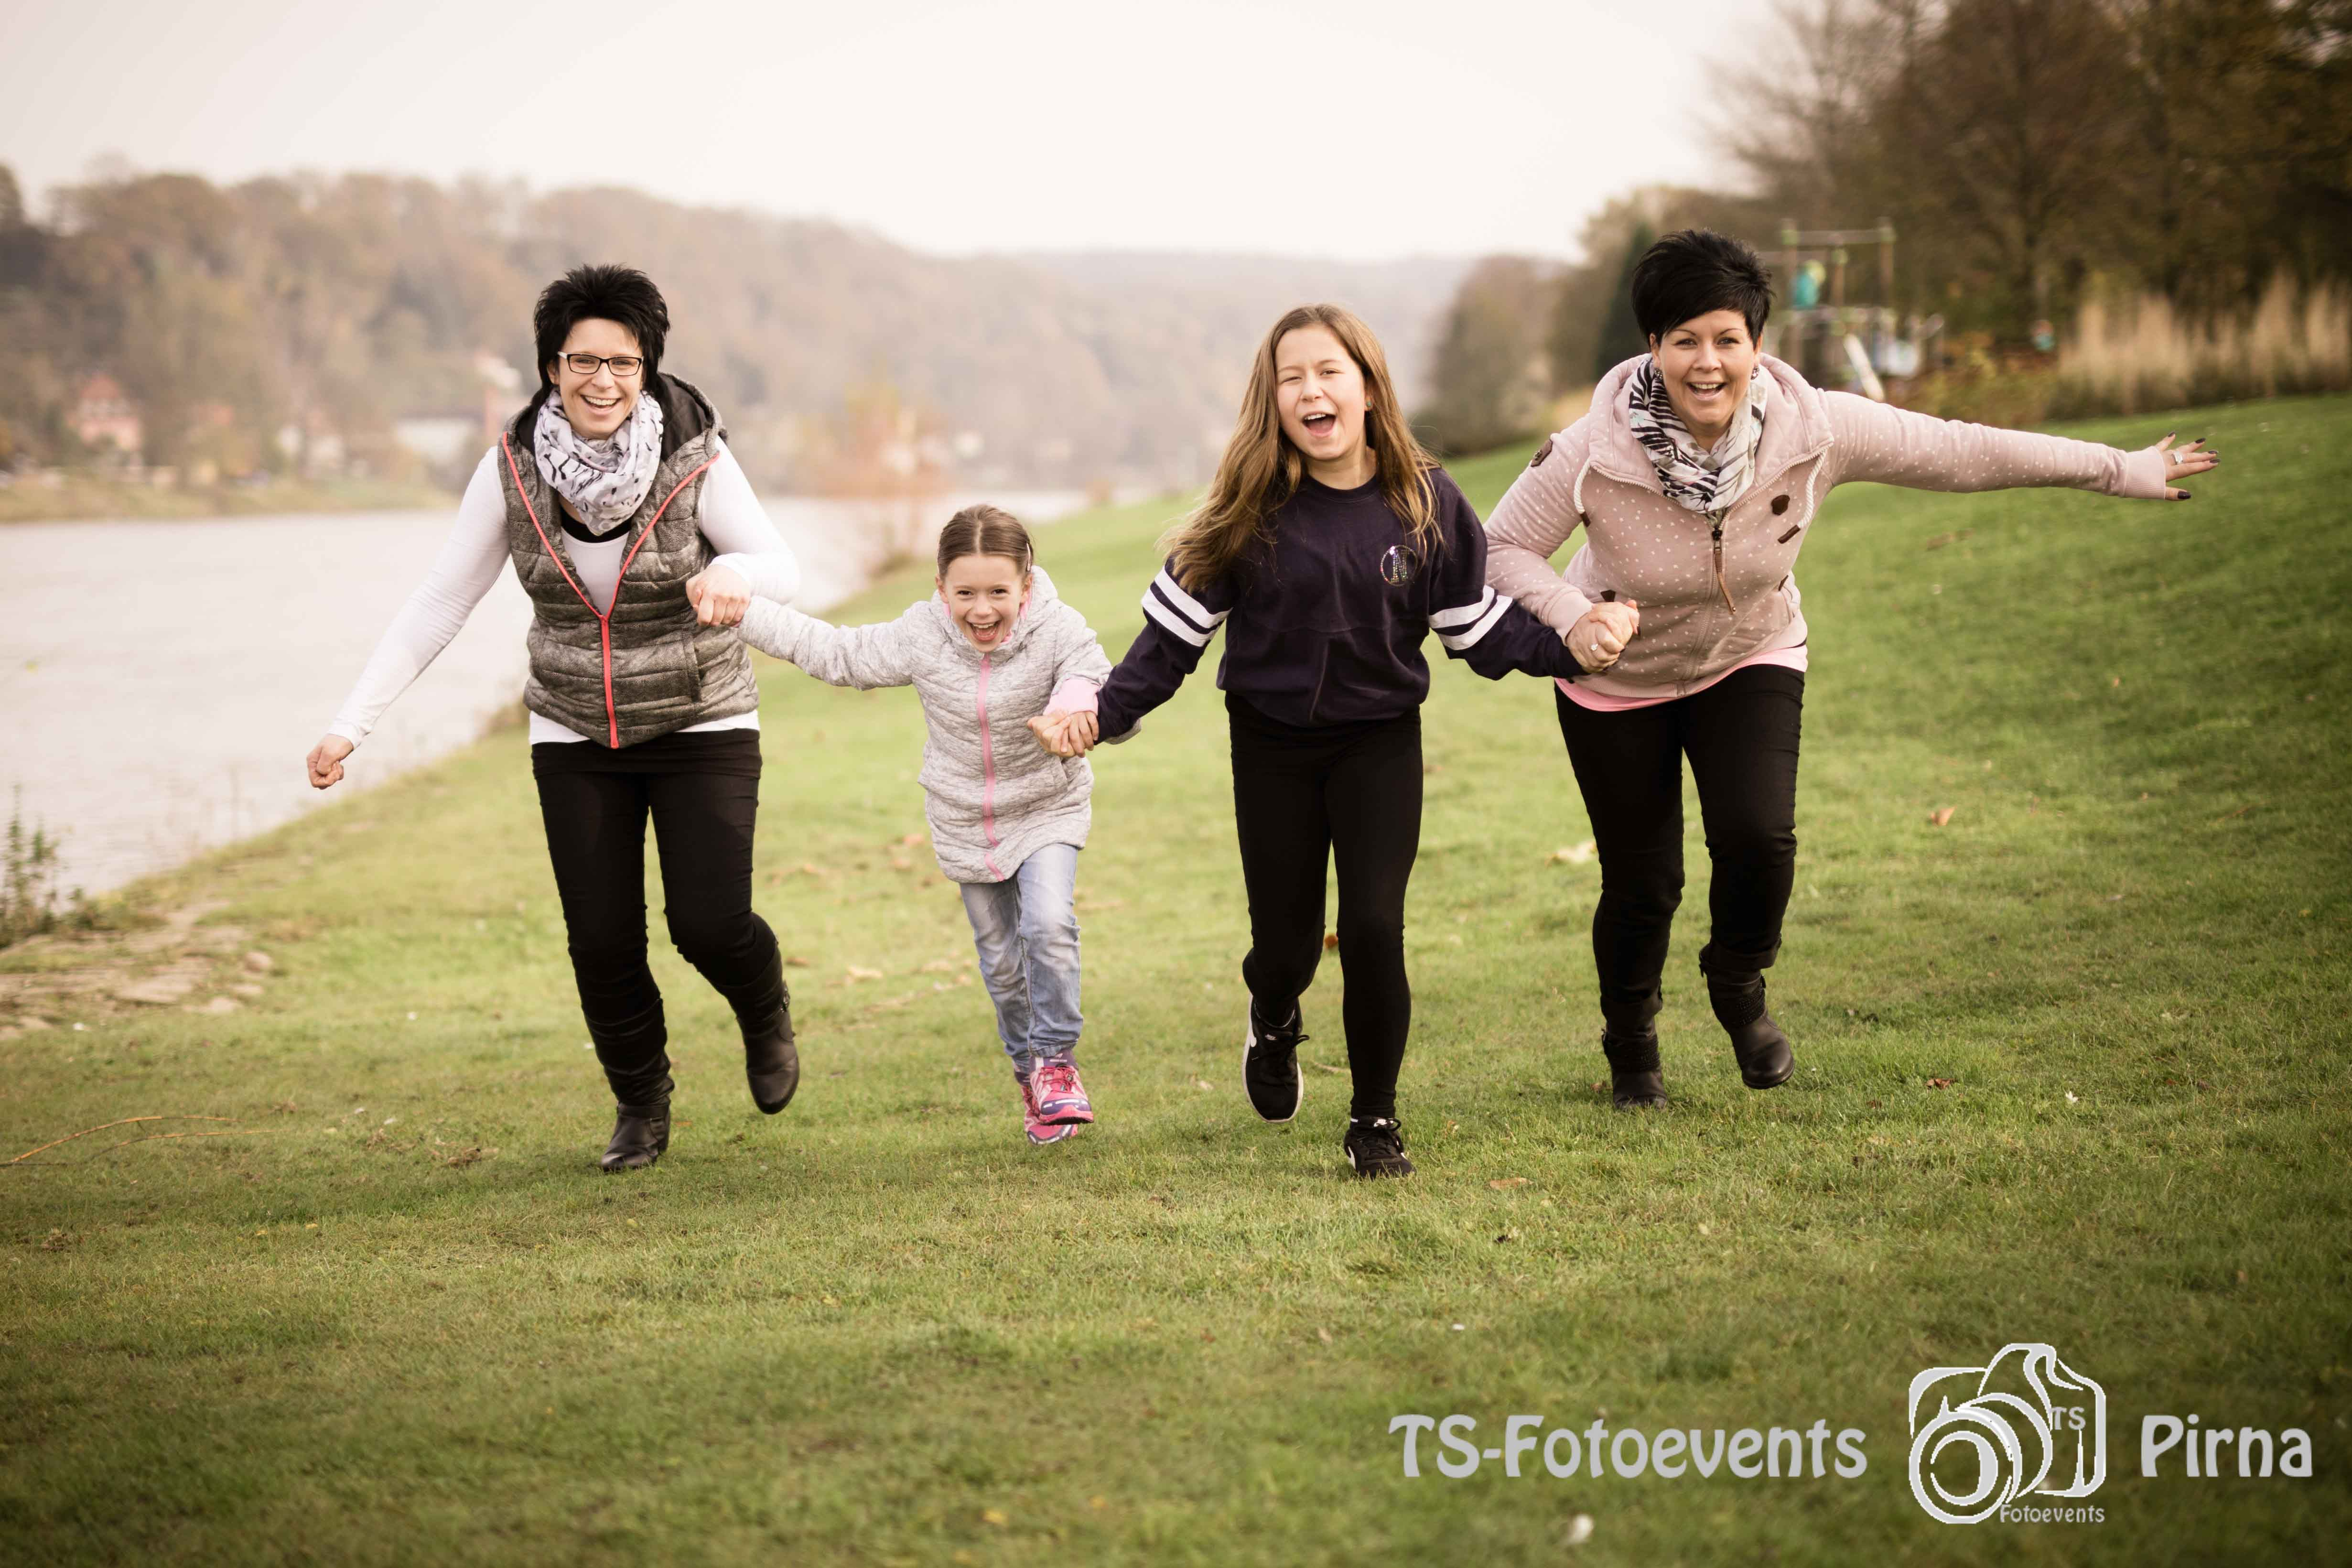 Familienfotos Pirna